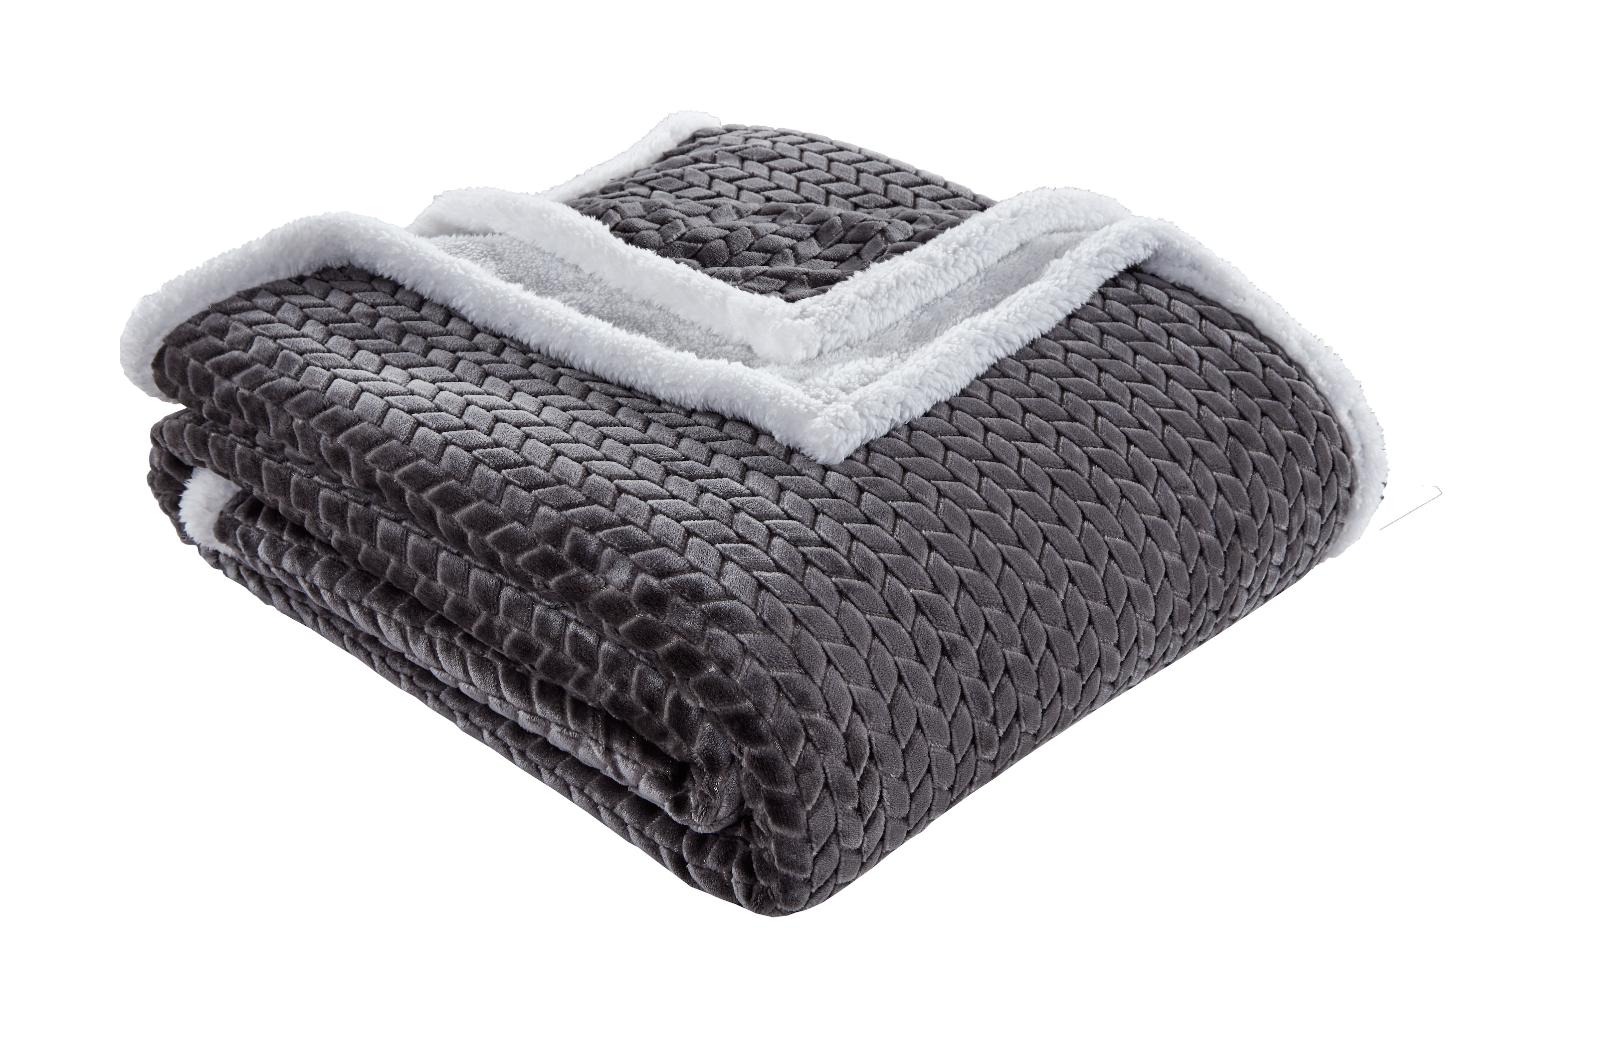 Braided Oversized Ultra Plush Sherpa Blanket Covers - Assort